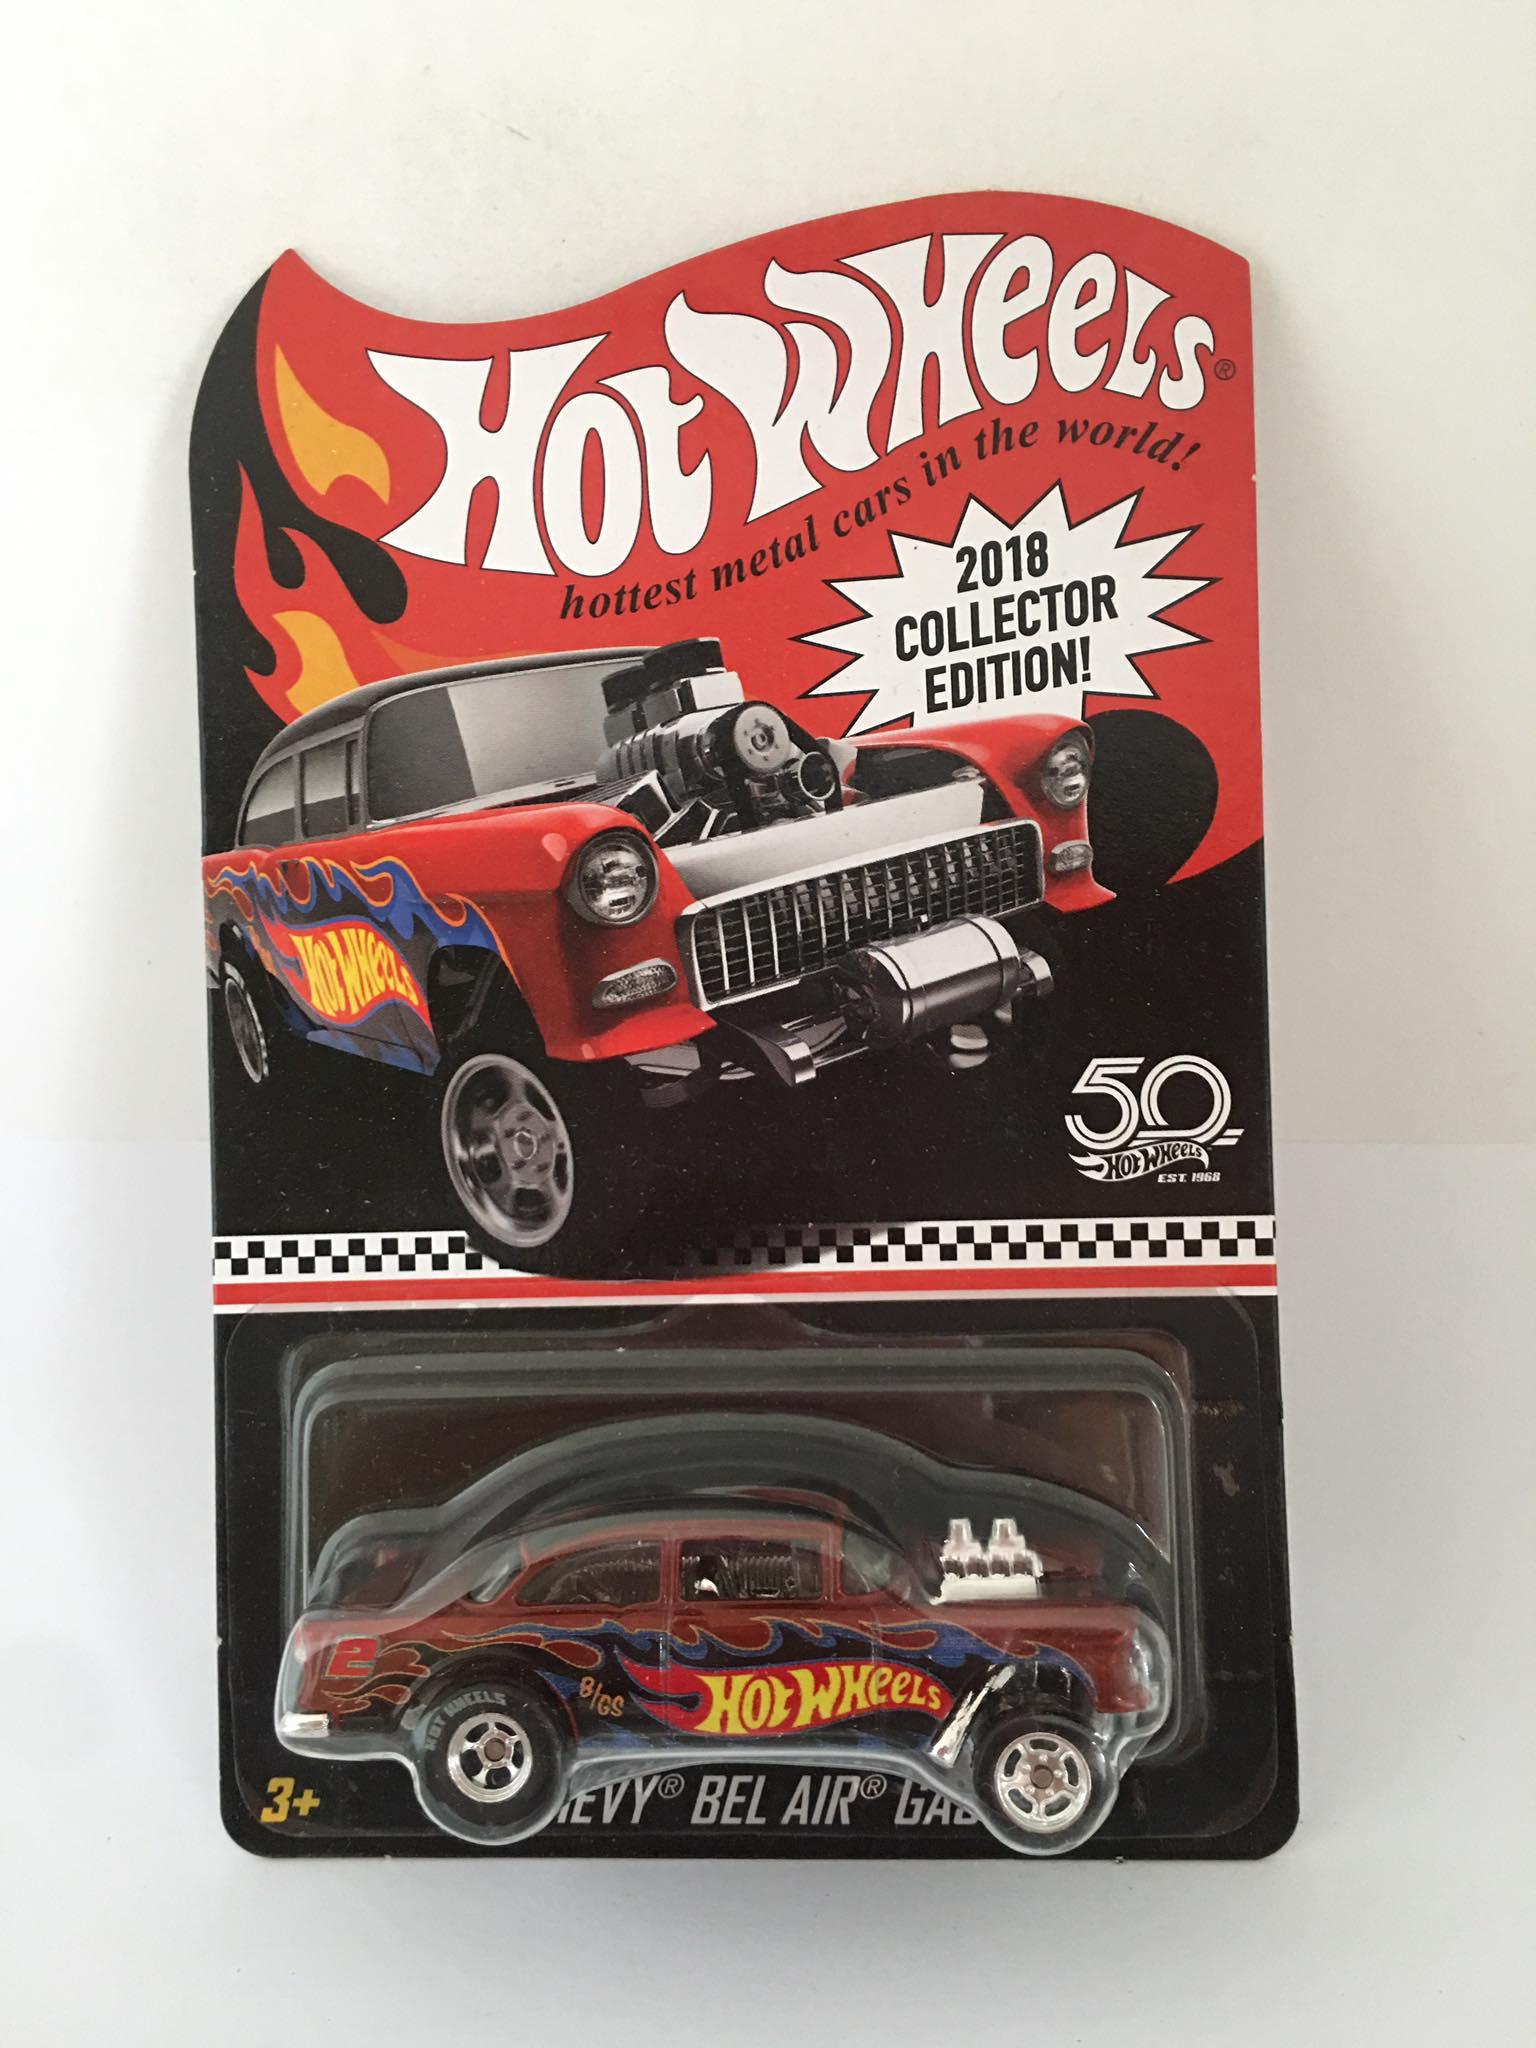 Hot Wheels - 55 Chevy Bel Air Gasser   - 2018 Collector Edition Kmart